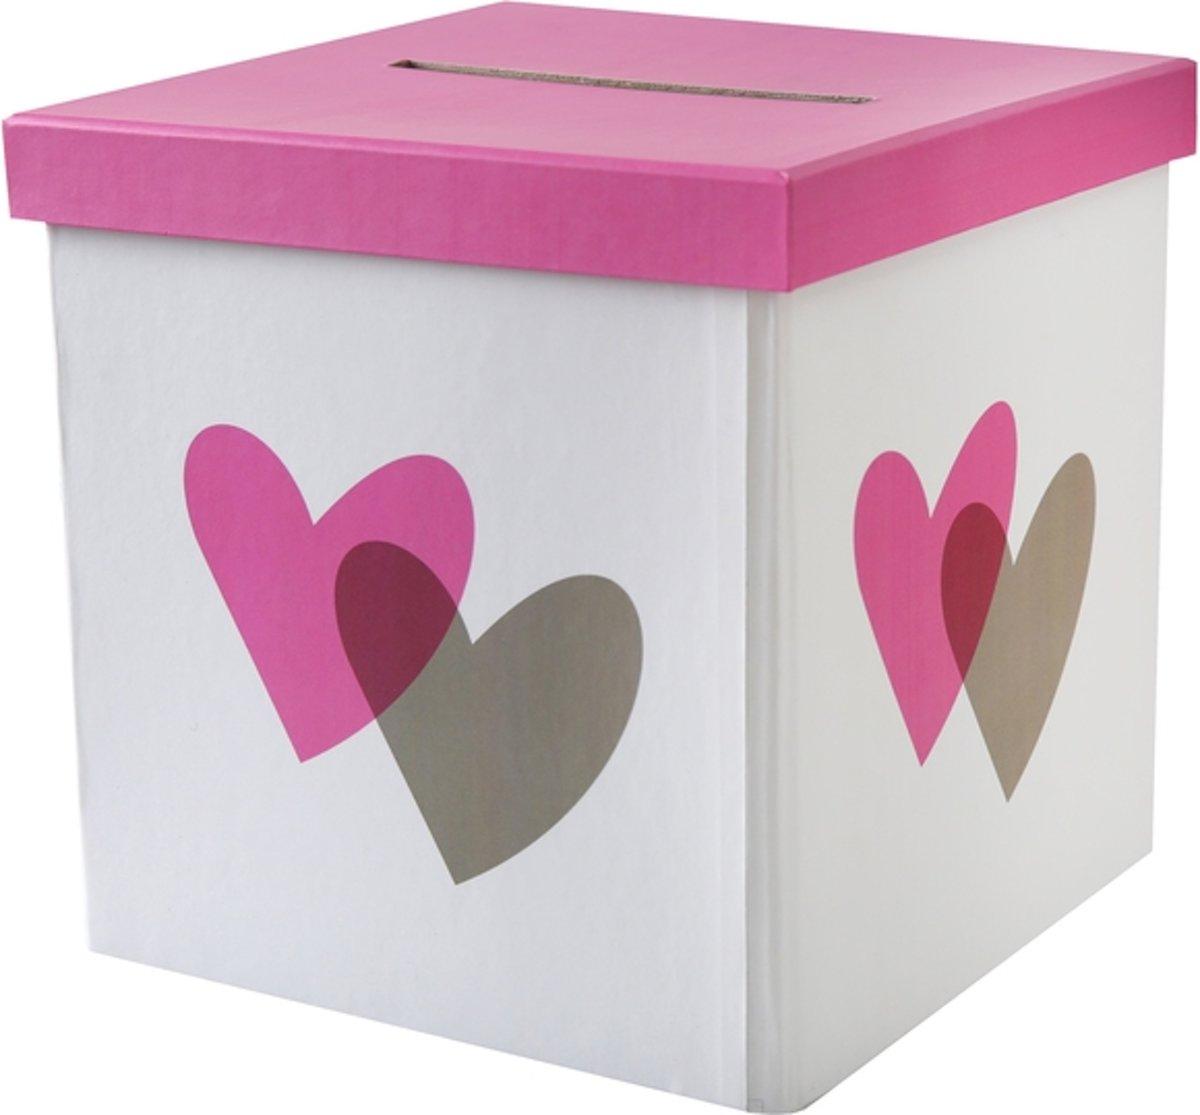 Santex Enveloppendoos harten roze kopen